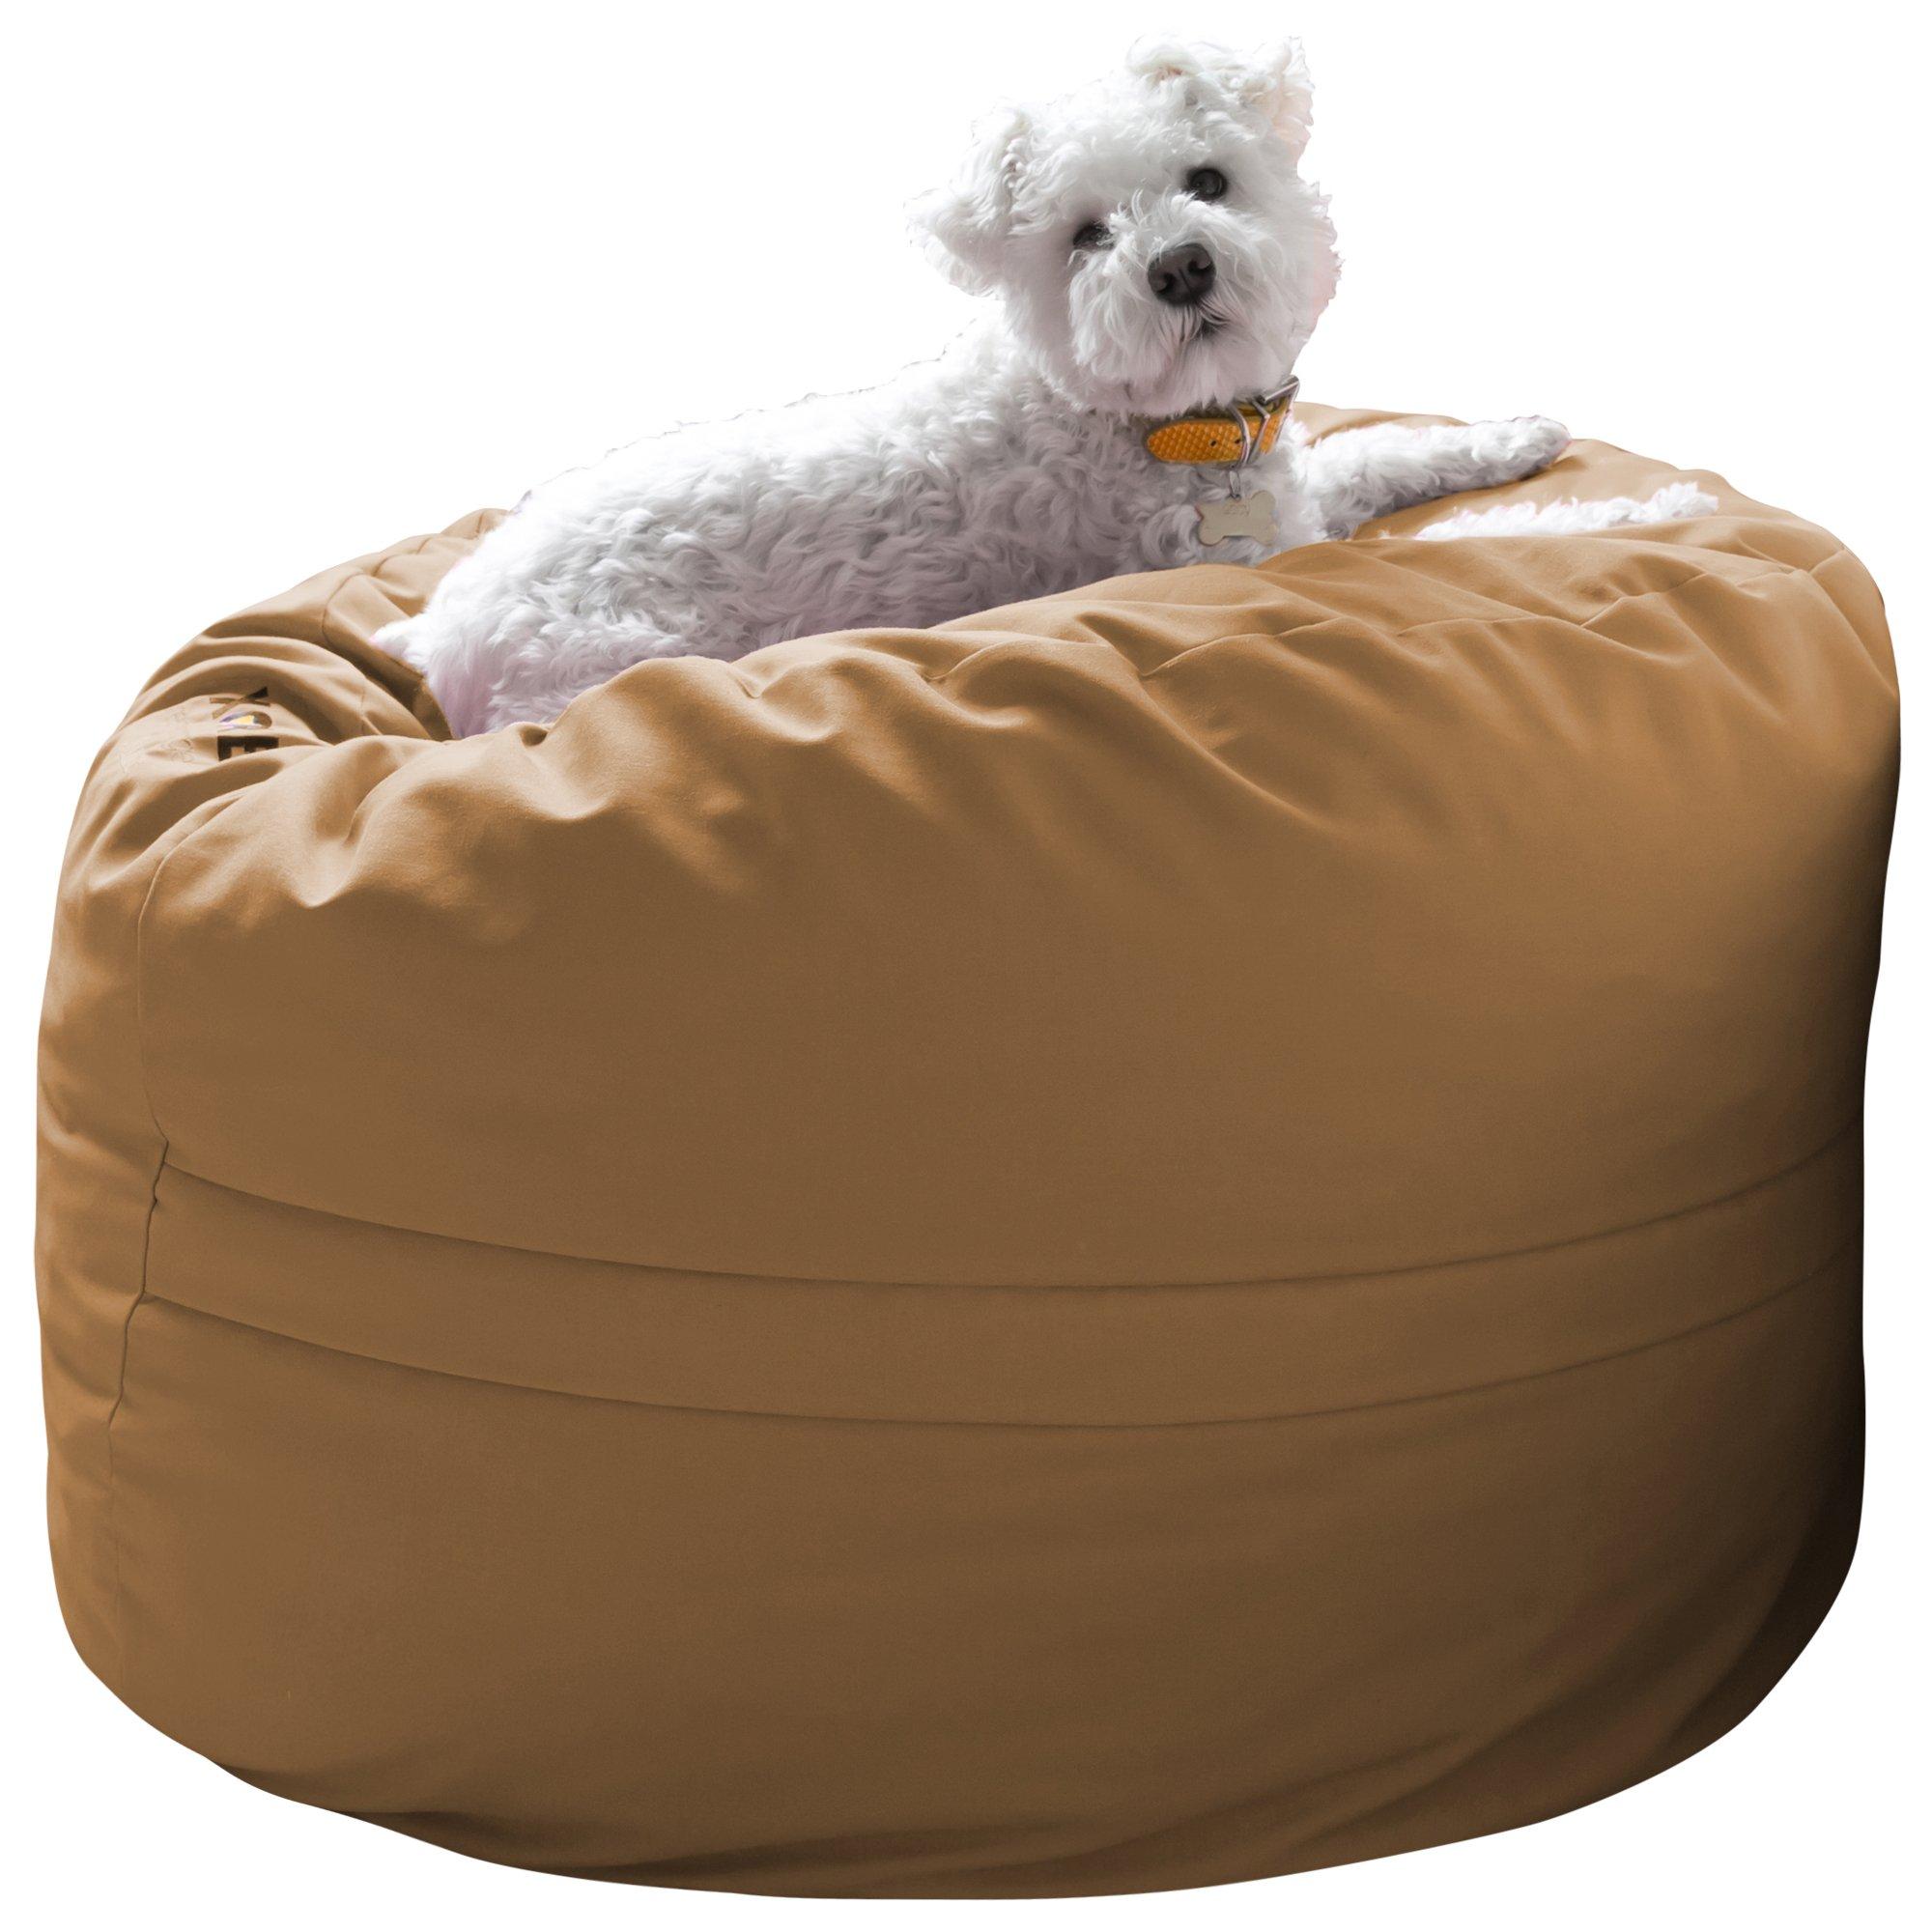 Xorbee 3-Foot Foam-Filled Bean Bag Chair in Twill, Cafe Tan